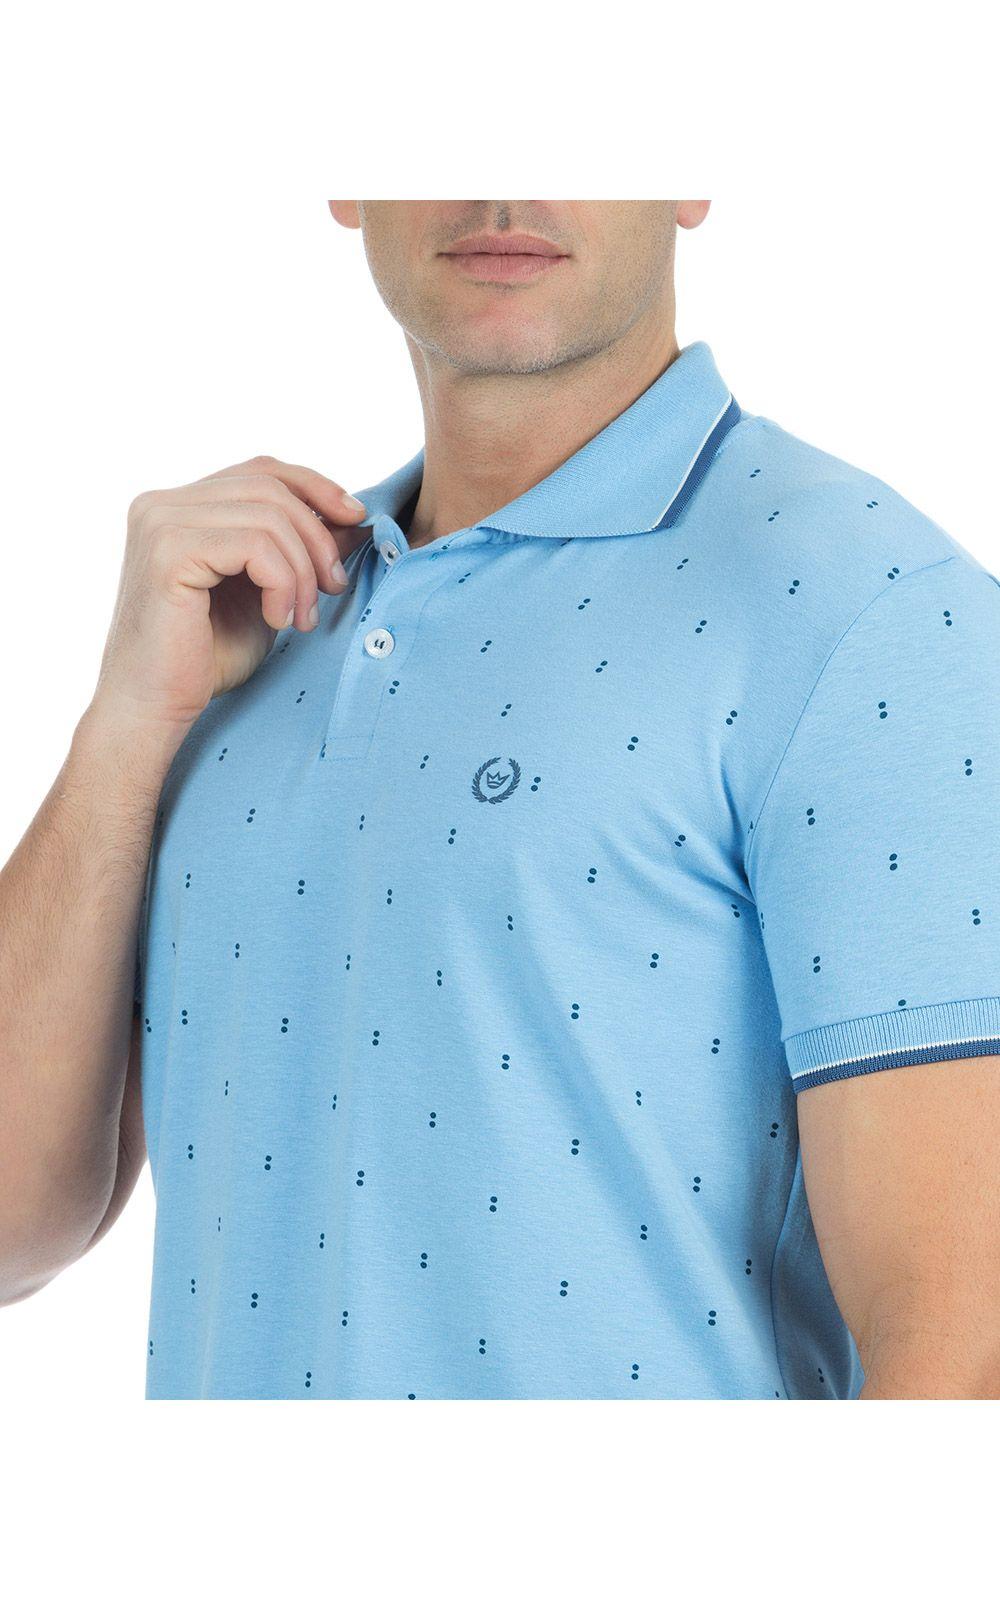 Foto 3 - Camisa Polo Masculina Azul Claro Estampada